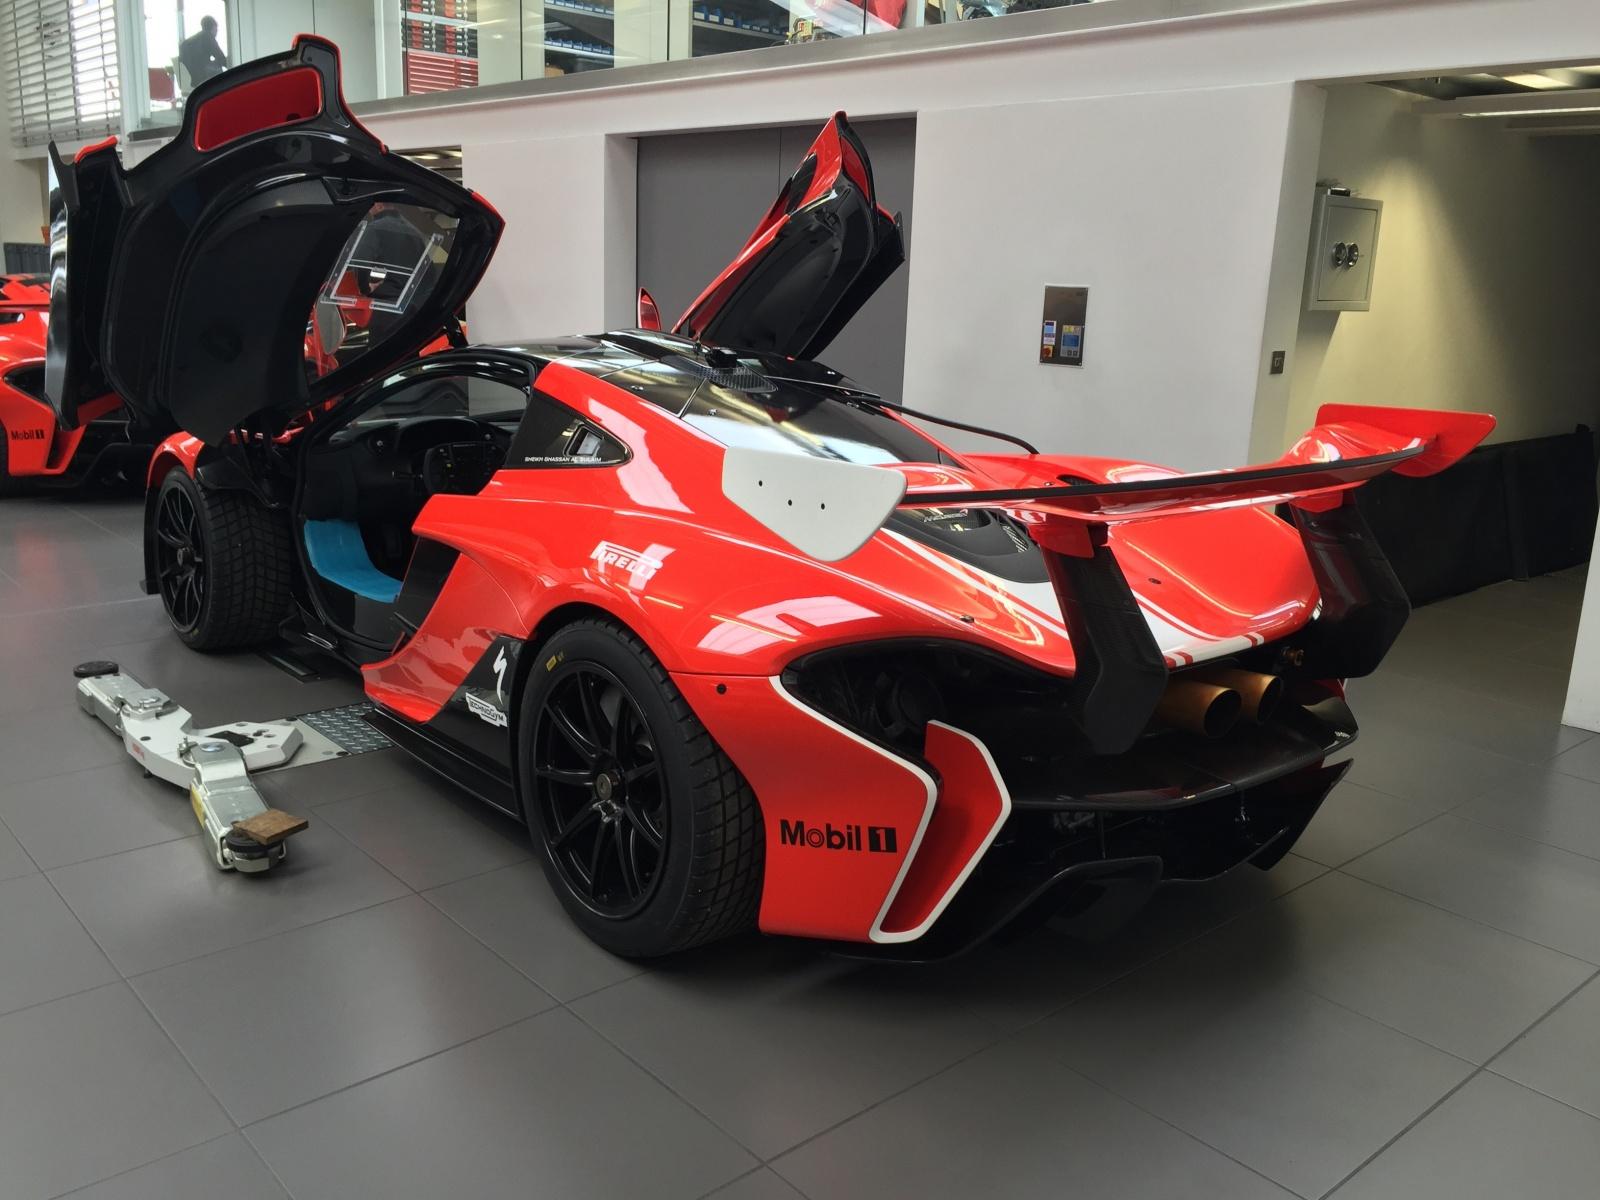 Street-Legal McLaren P1 GTR For Sale - Exotic Car List